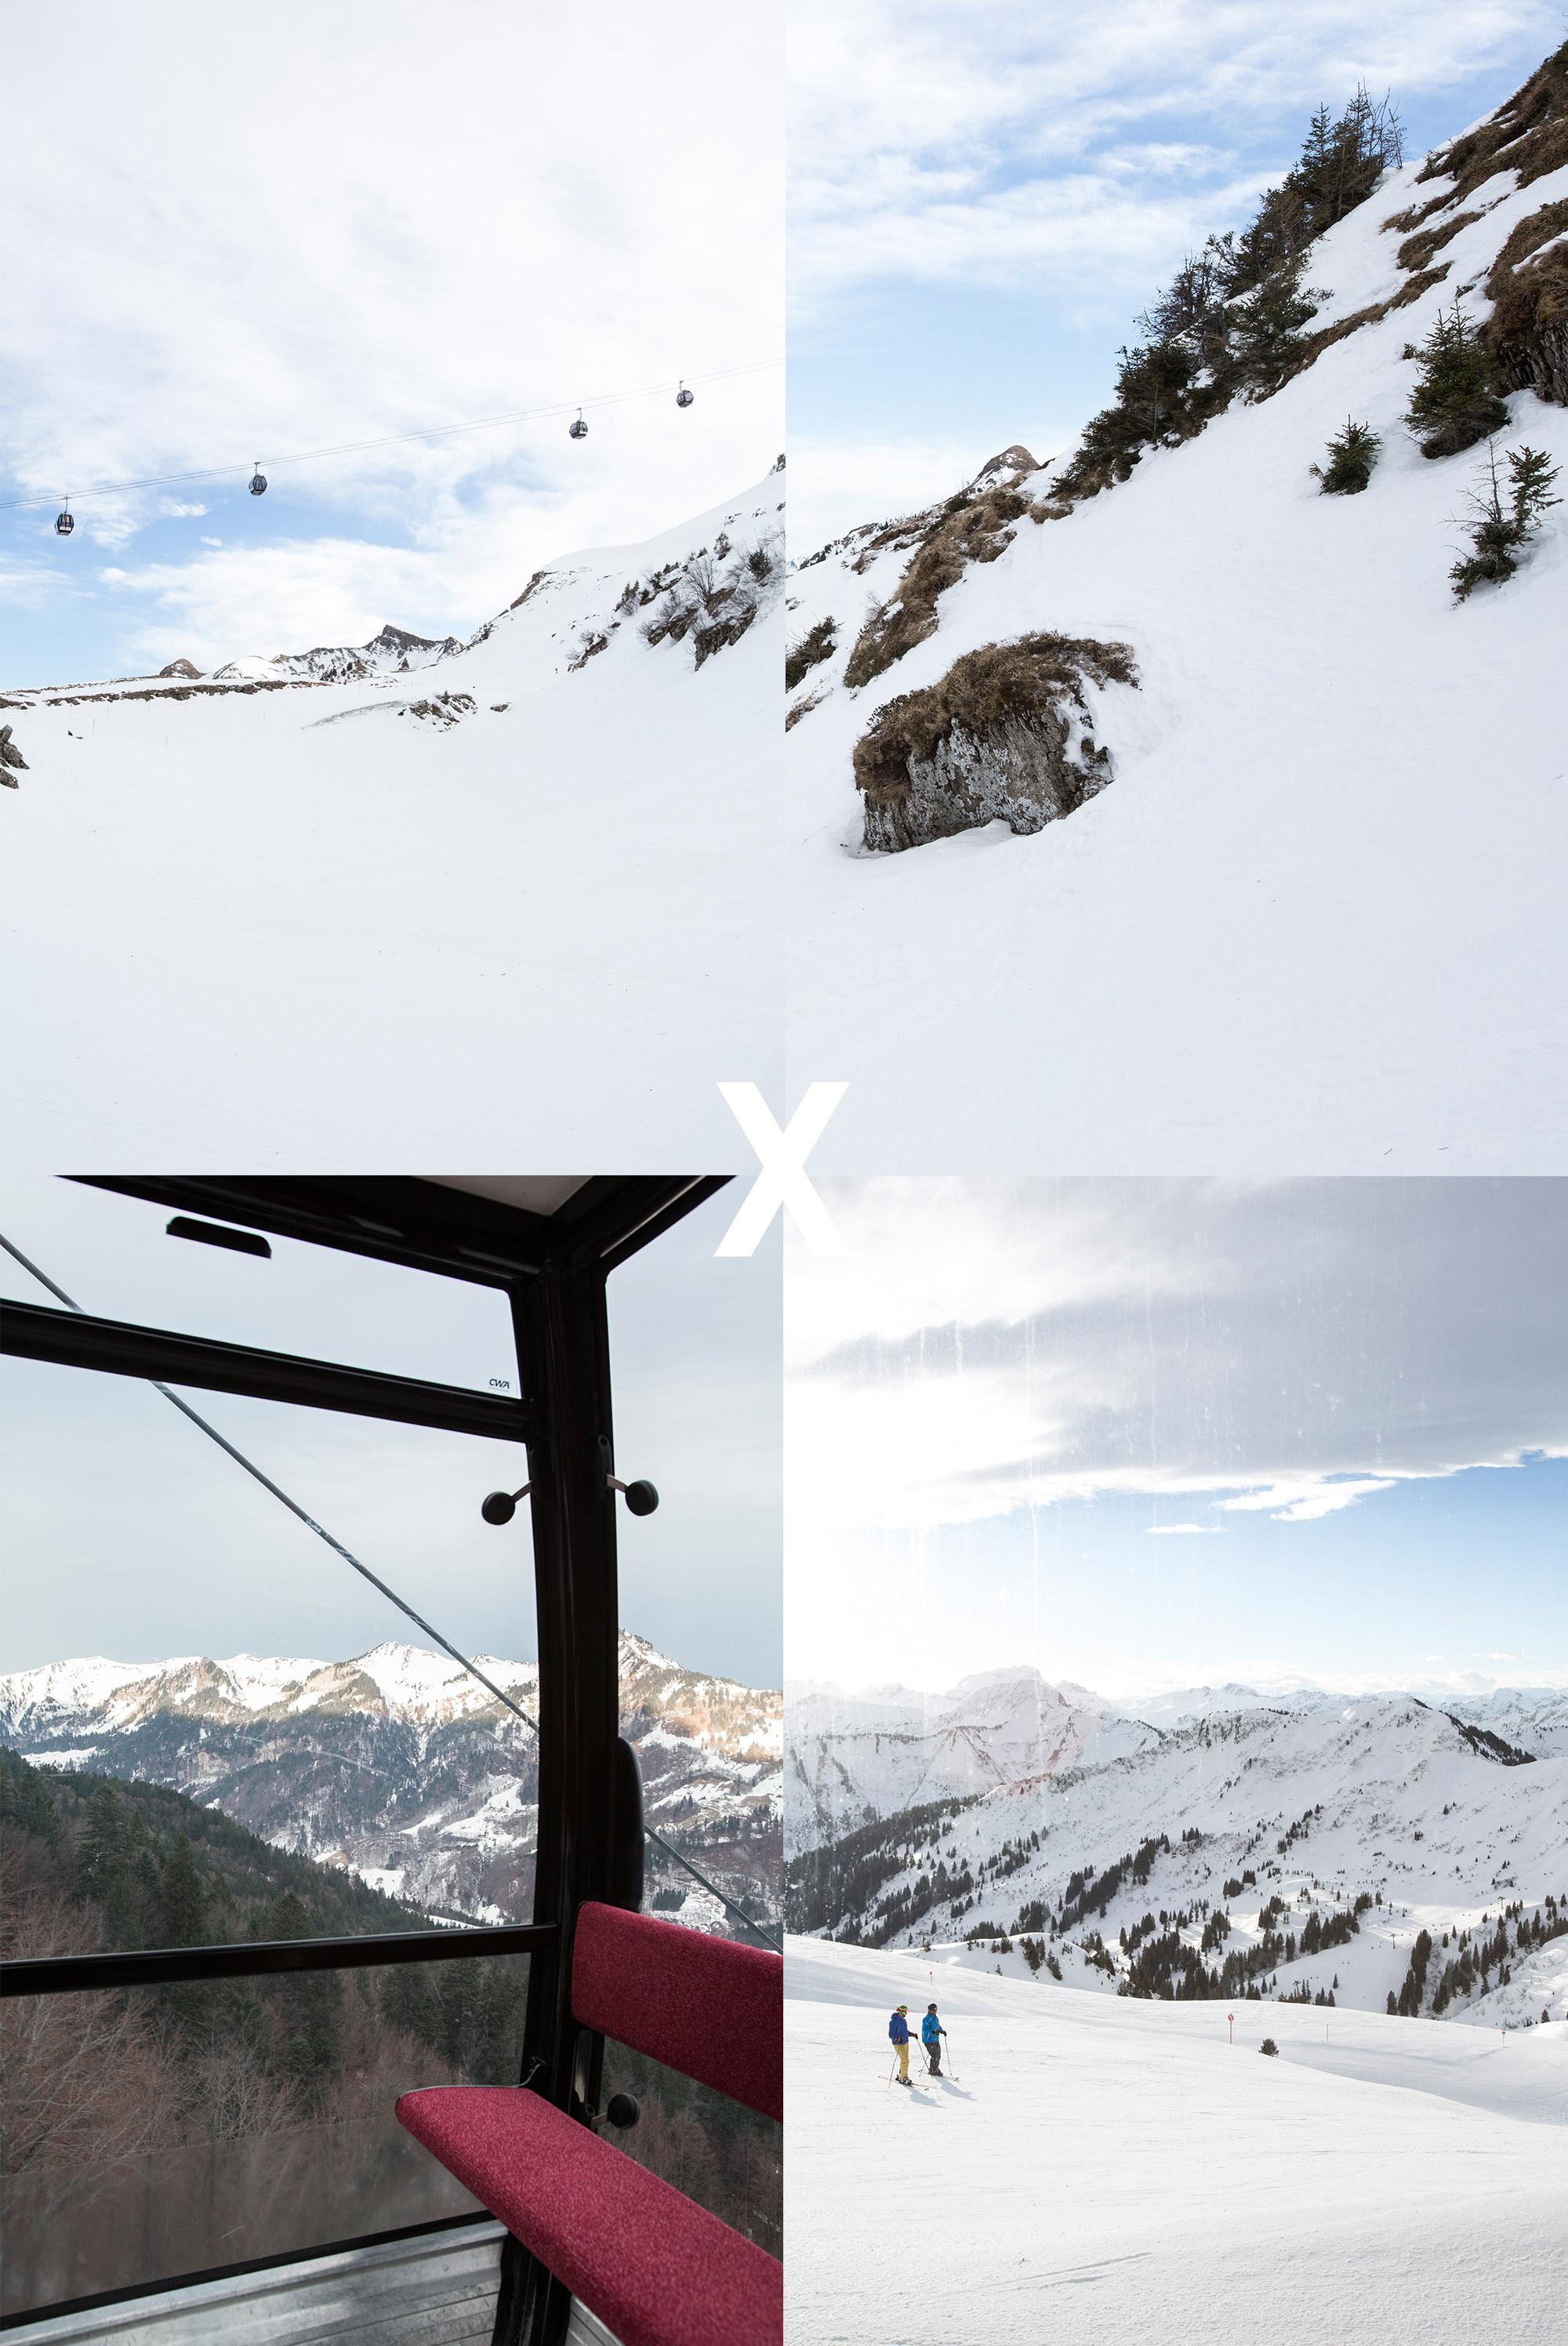 visiter autriche hiver